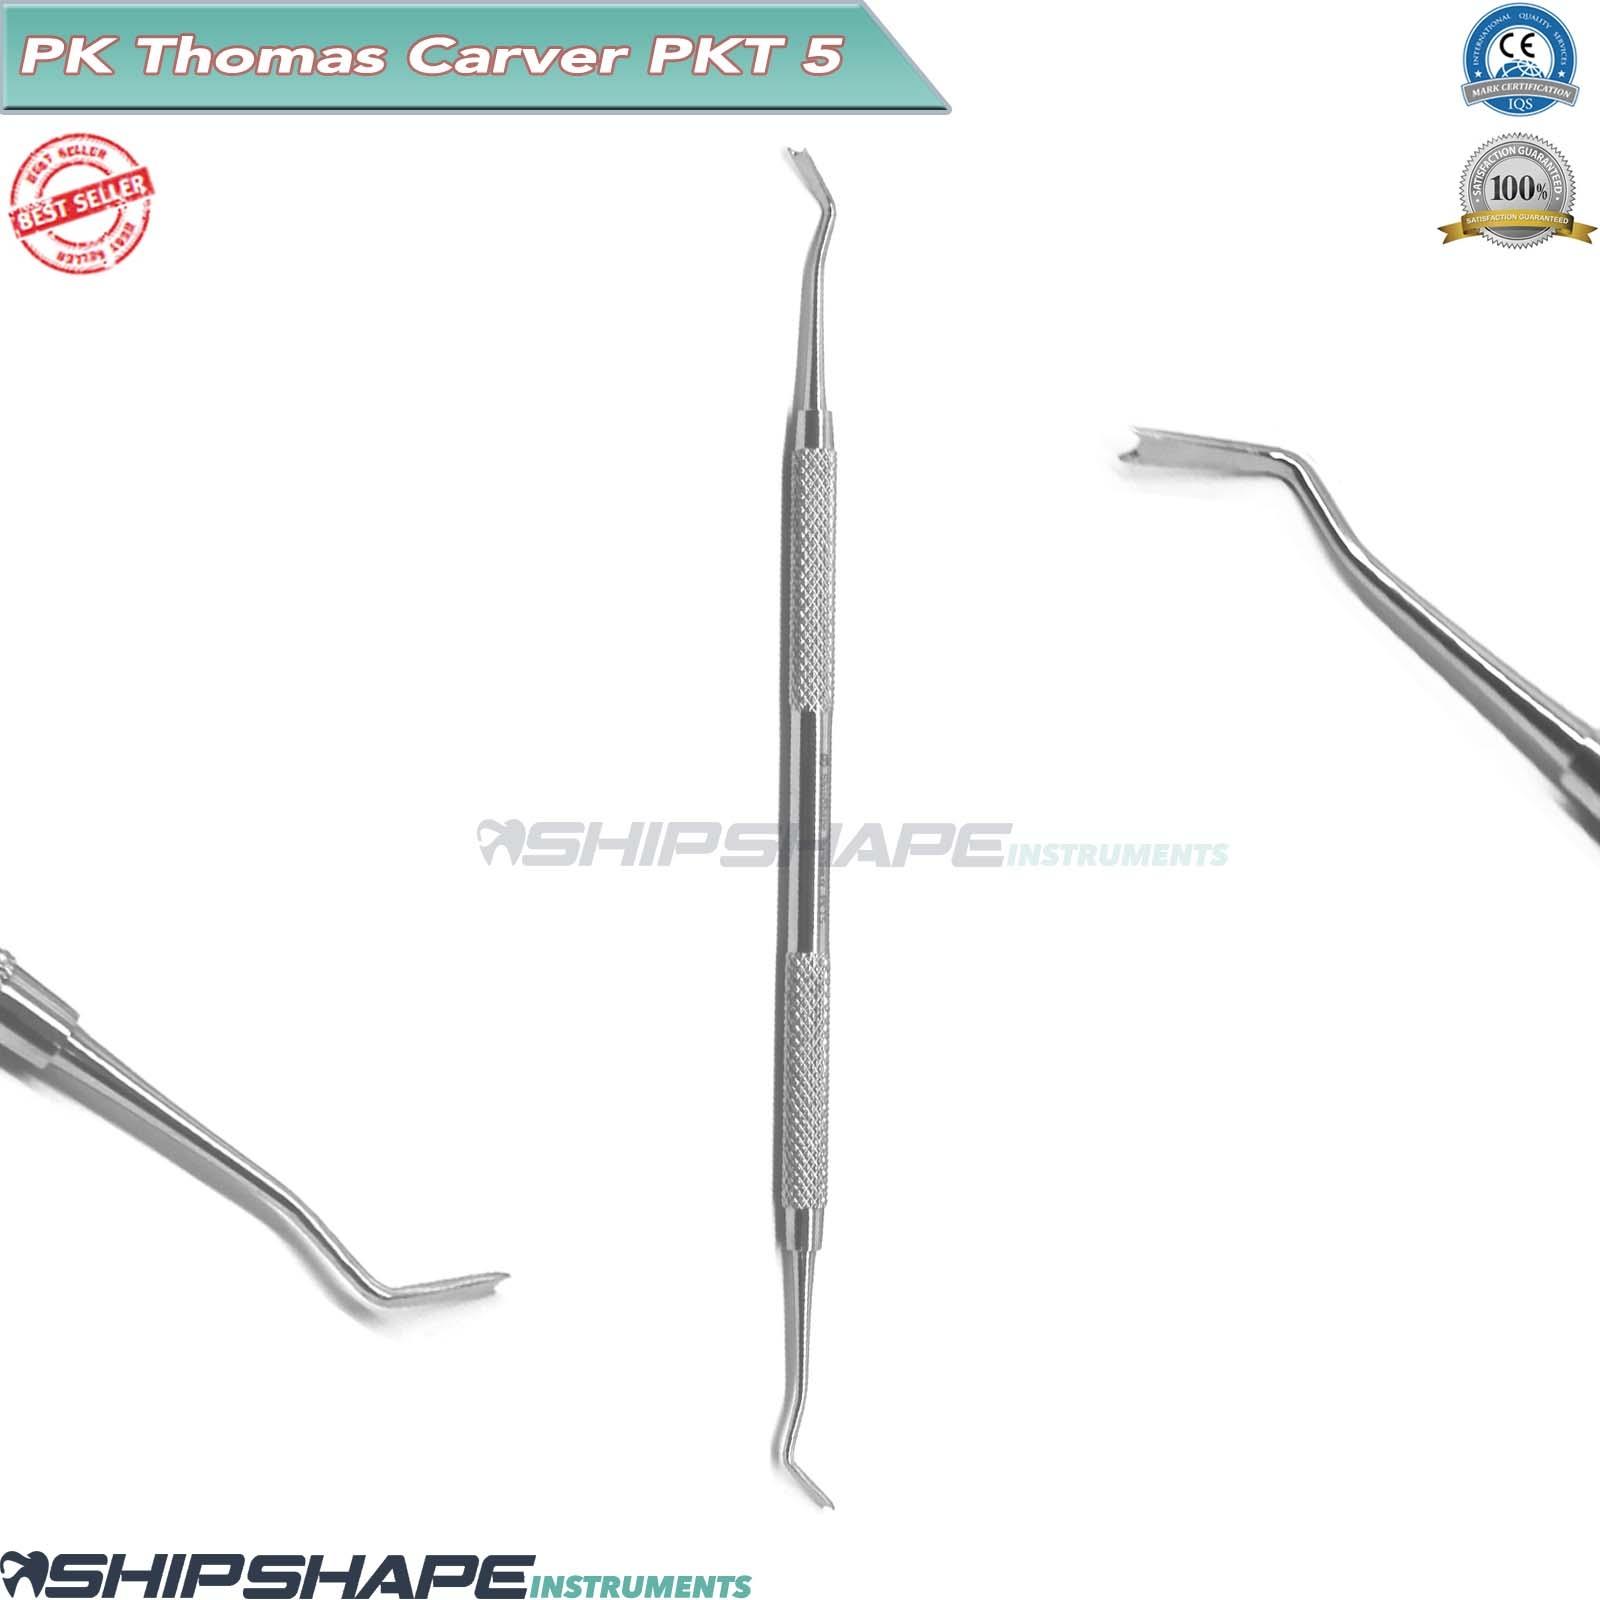 Dental PK Thomas Carver PKT5 Restorative Filling Instruments PKT5-005 | Shipshape Instruments-0